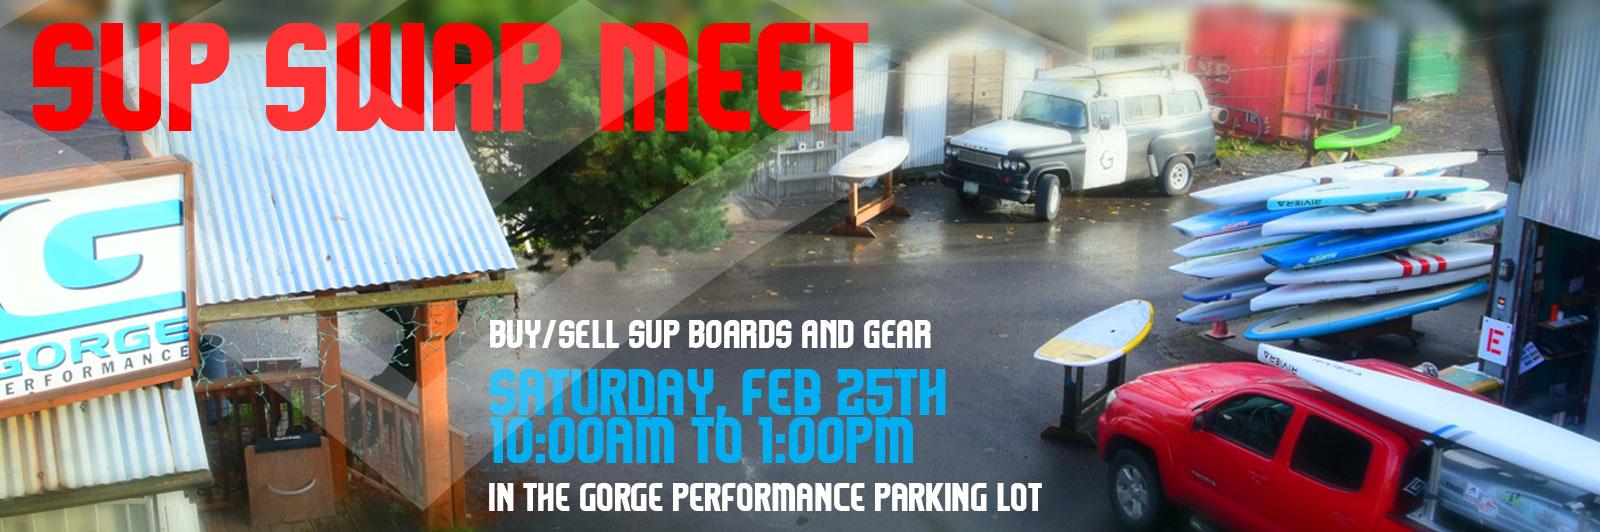 Gorge Performance SUP Swap Meet